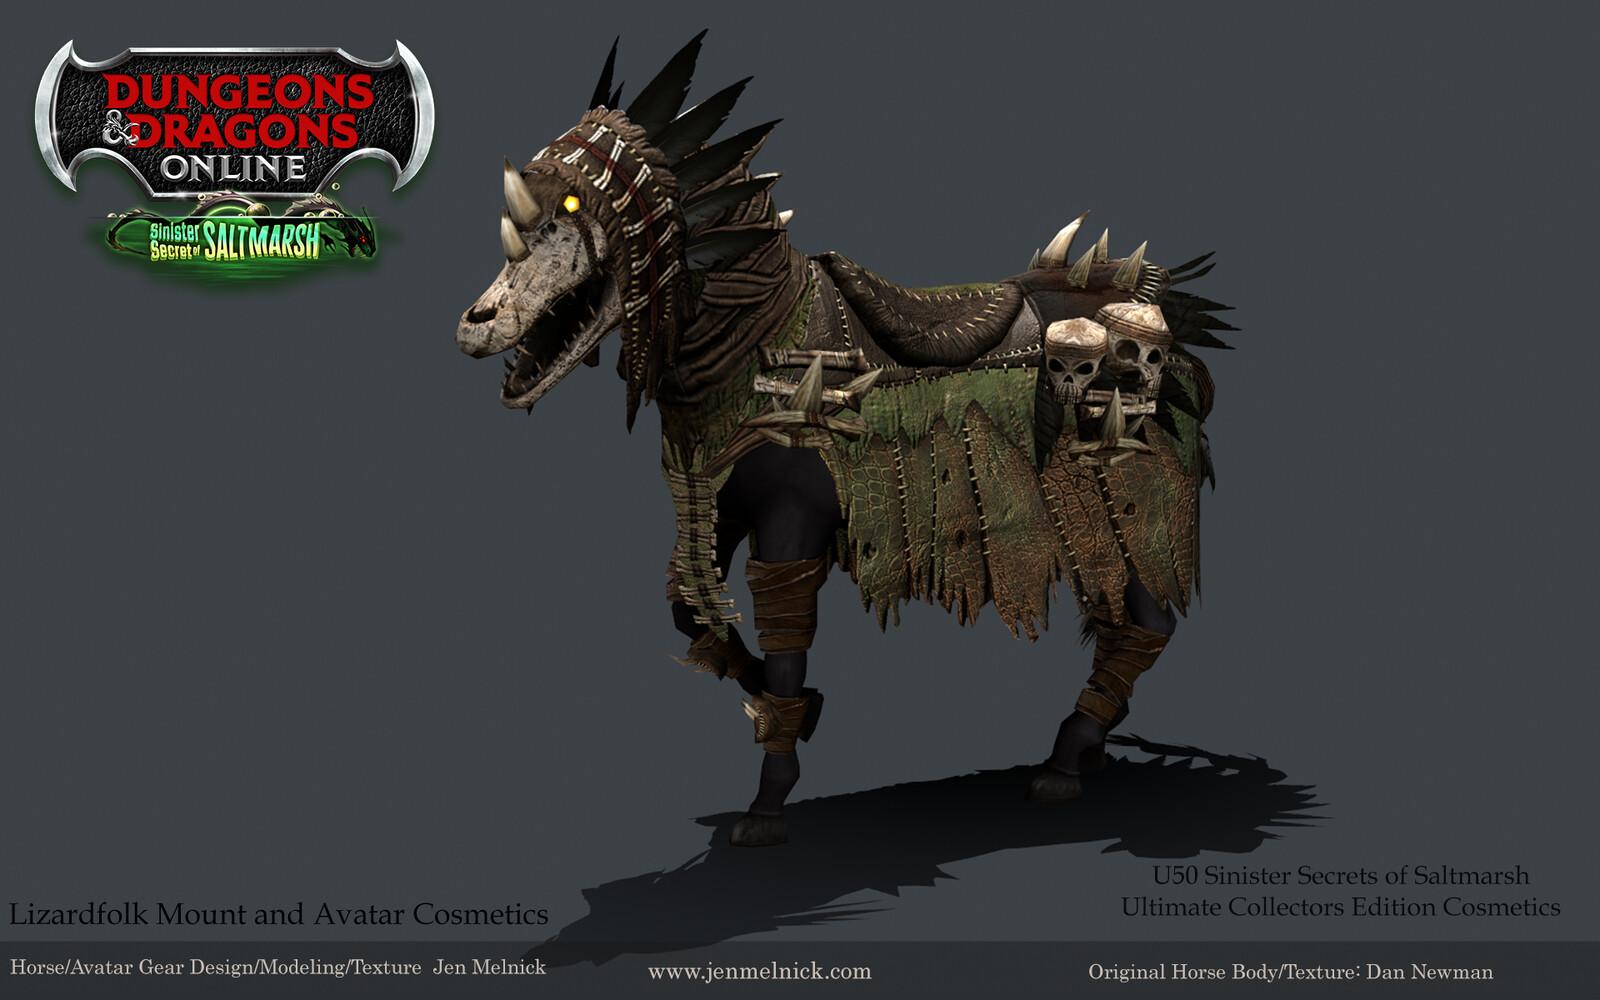 Dungeons and Dragons Online Lizardfolk Mount: Gear and Headpiece Sinister Secrets of Saltmarsh Mini-Expansion  Ultimate Fan Bundle Reward Marmoset Render